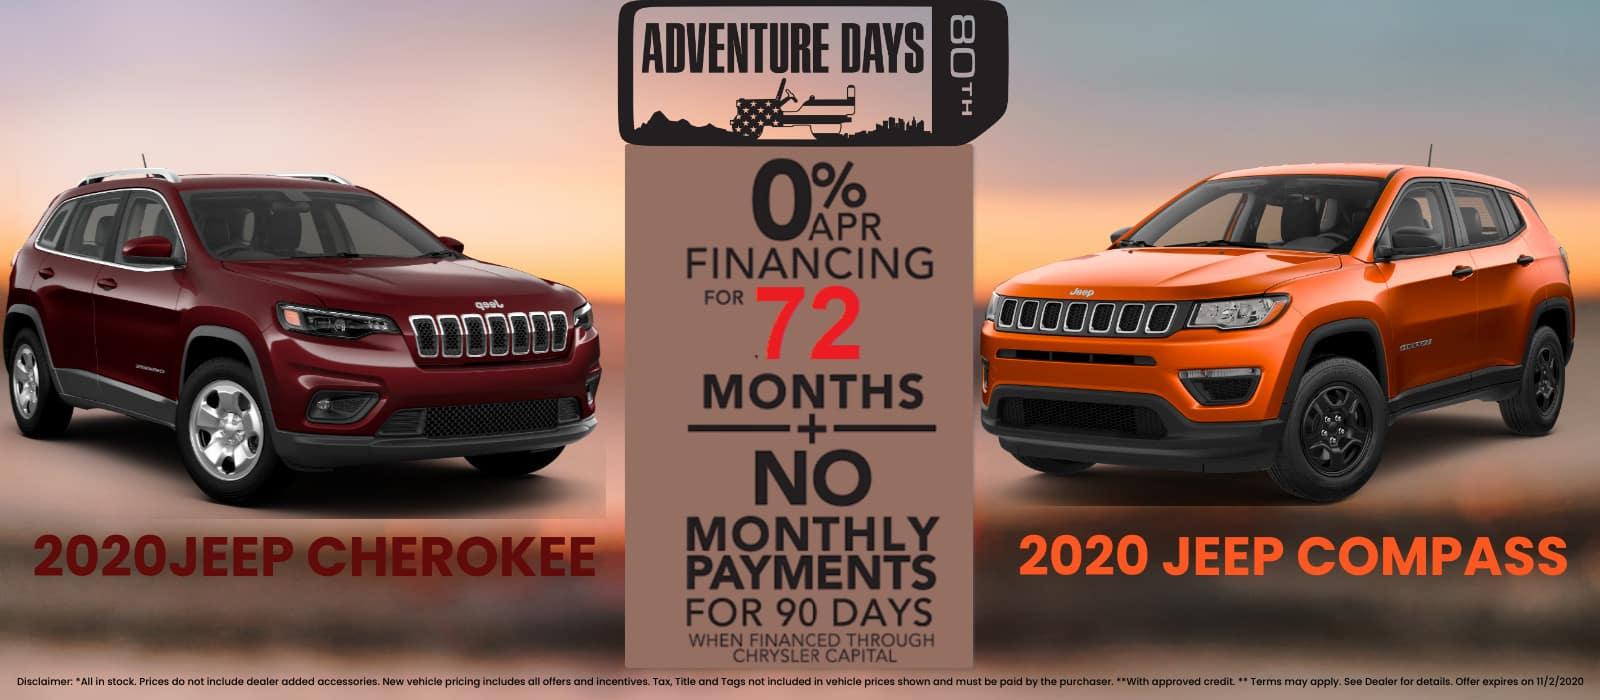 2020 Jeep Chero Campass special